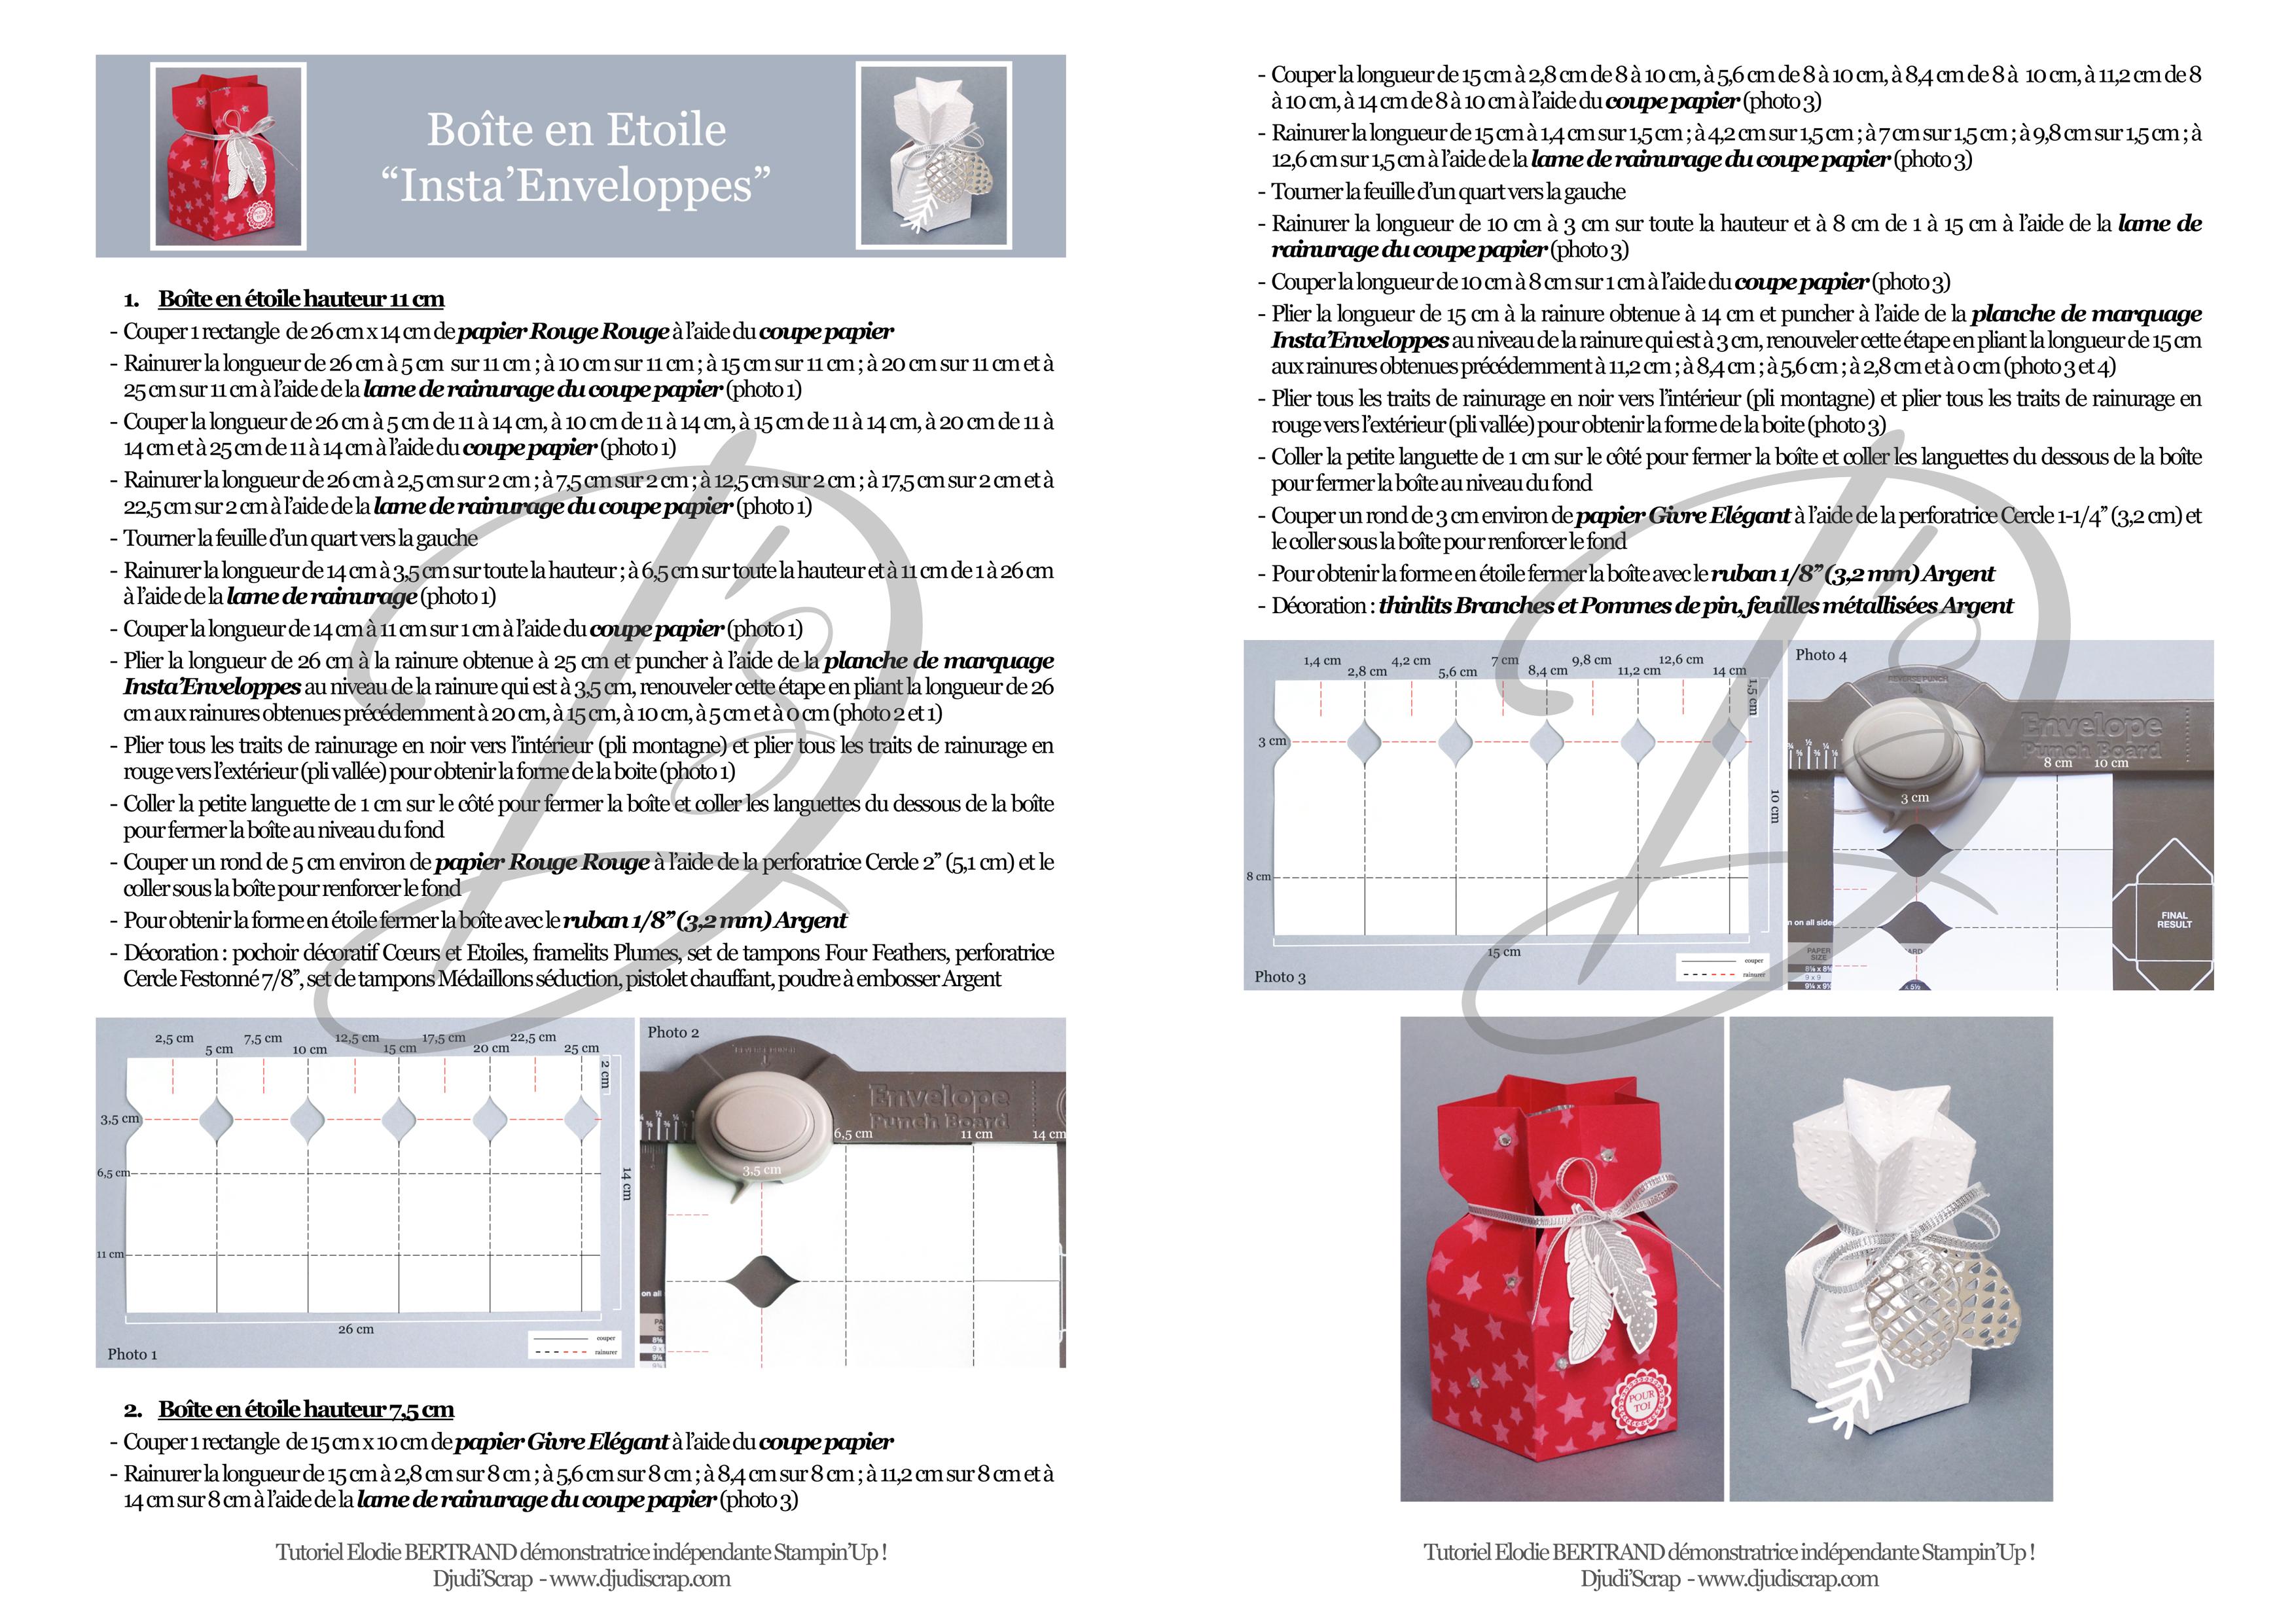 tutoriel-djudiscrap-boite-en-etoile-instaenveloppes